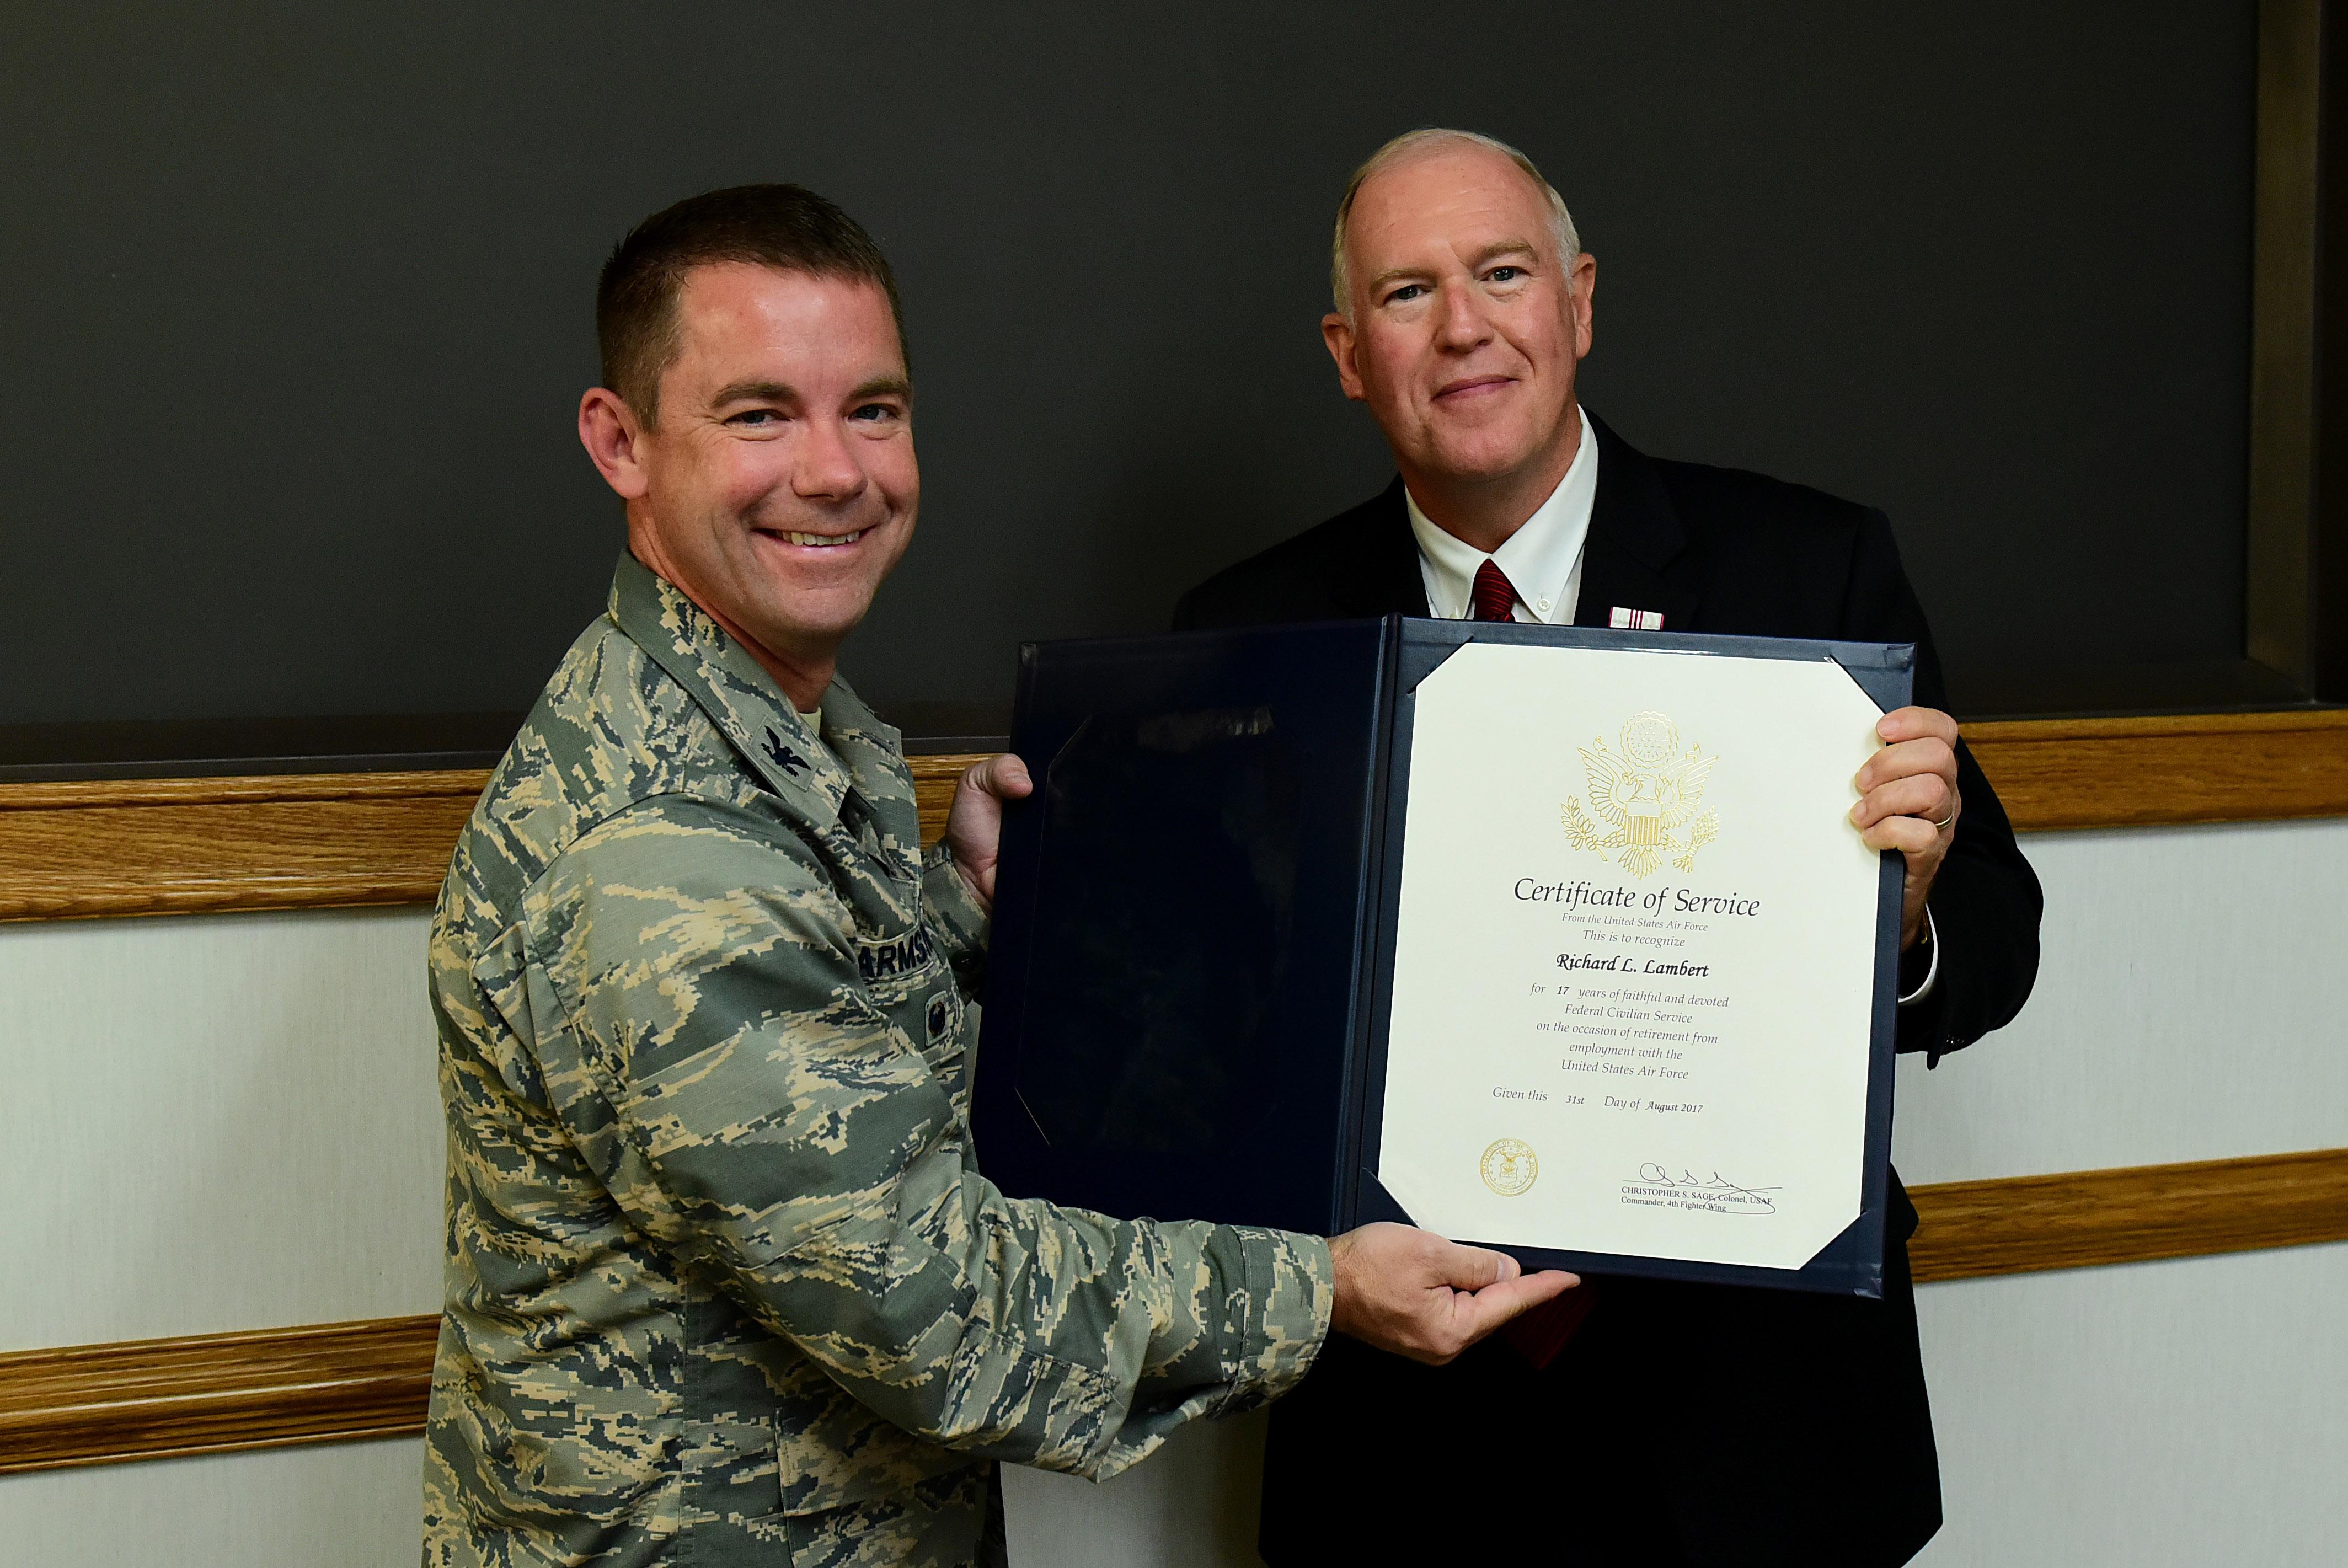 Mr. Lambert retires with F-15E flight and 'Eagle bite'